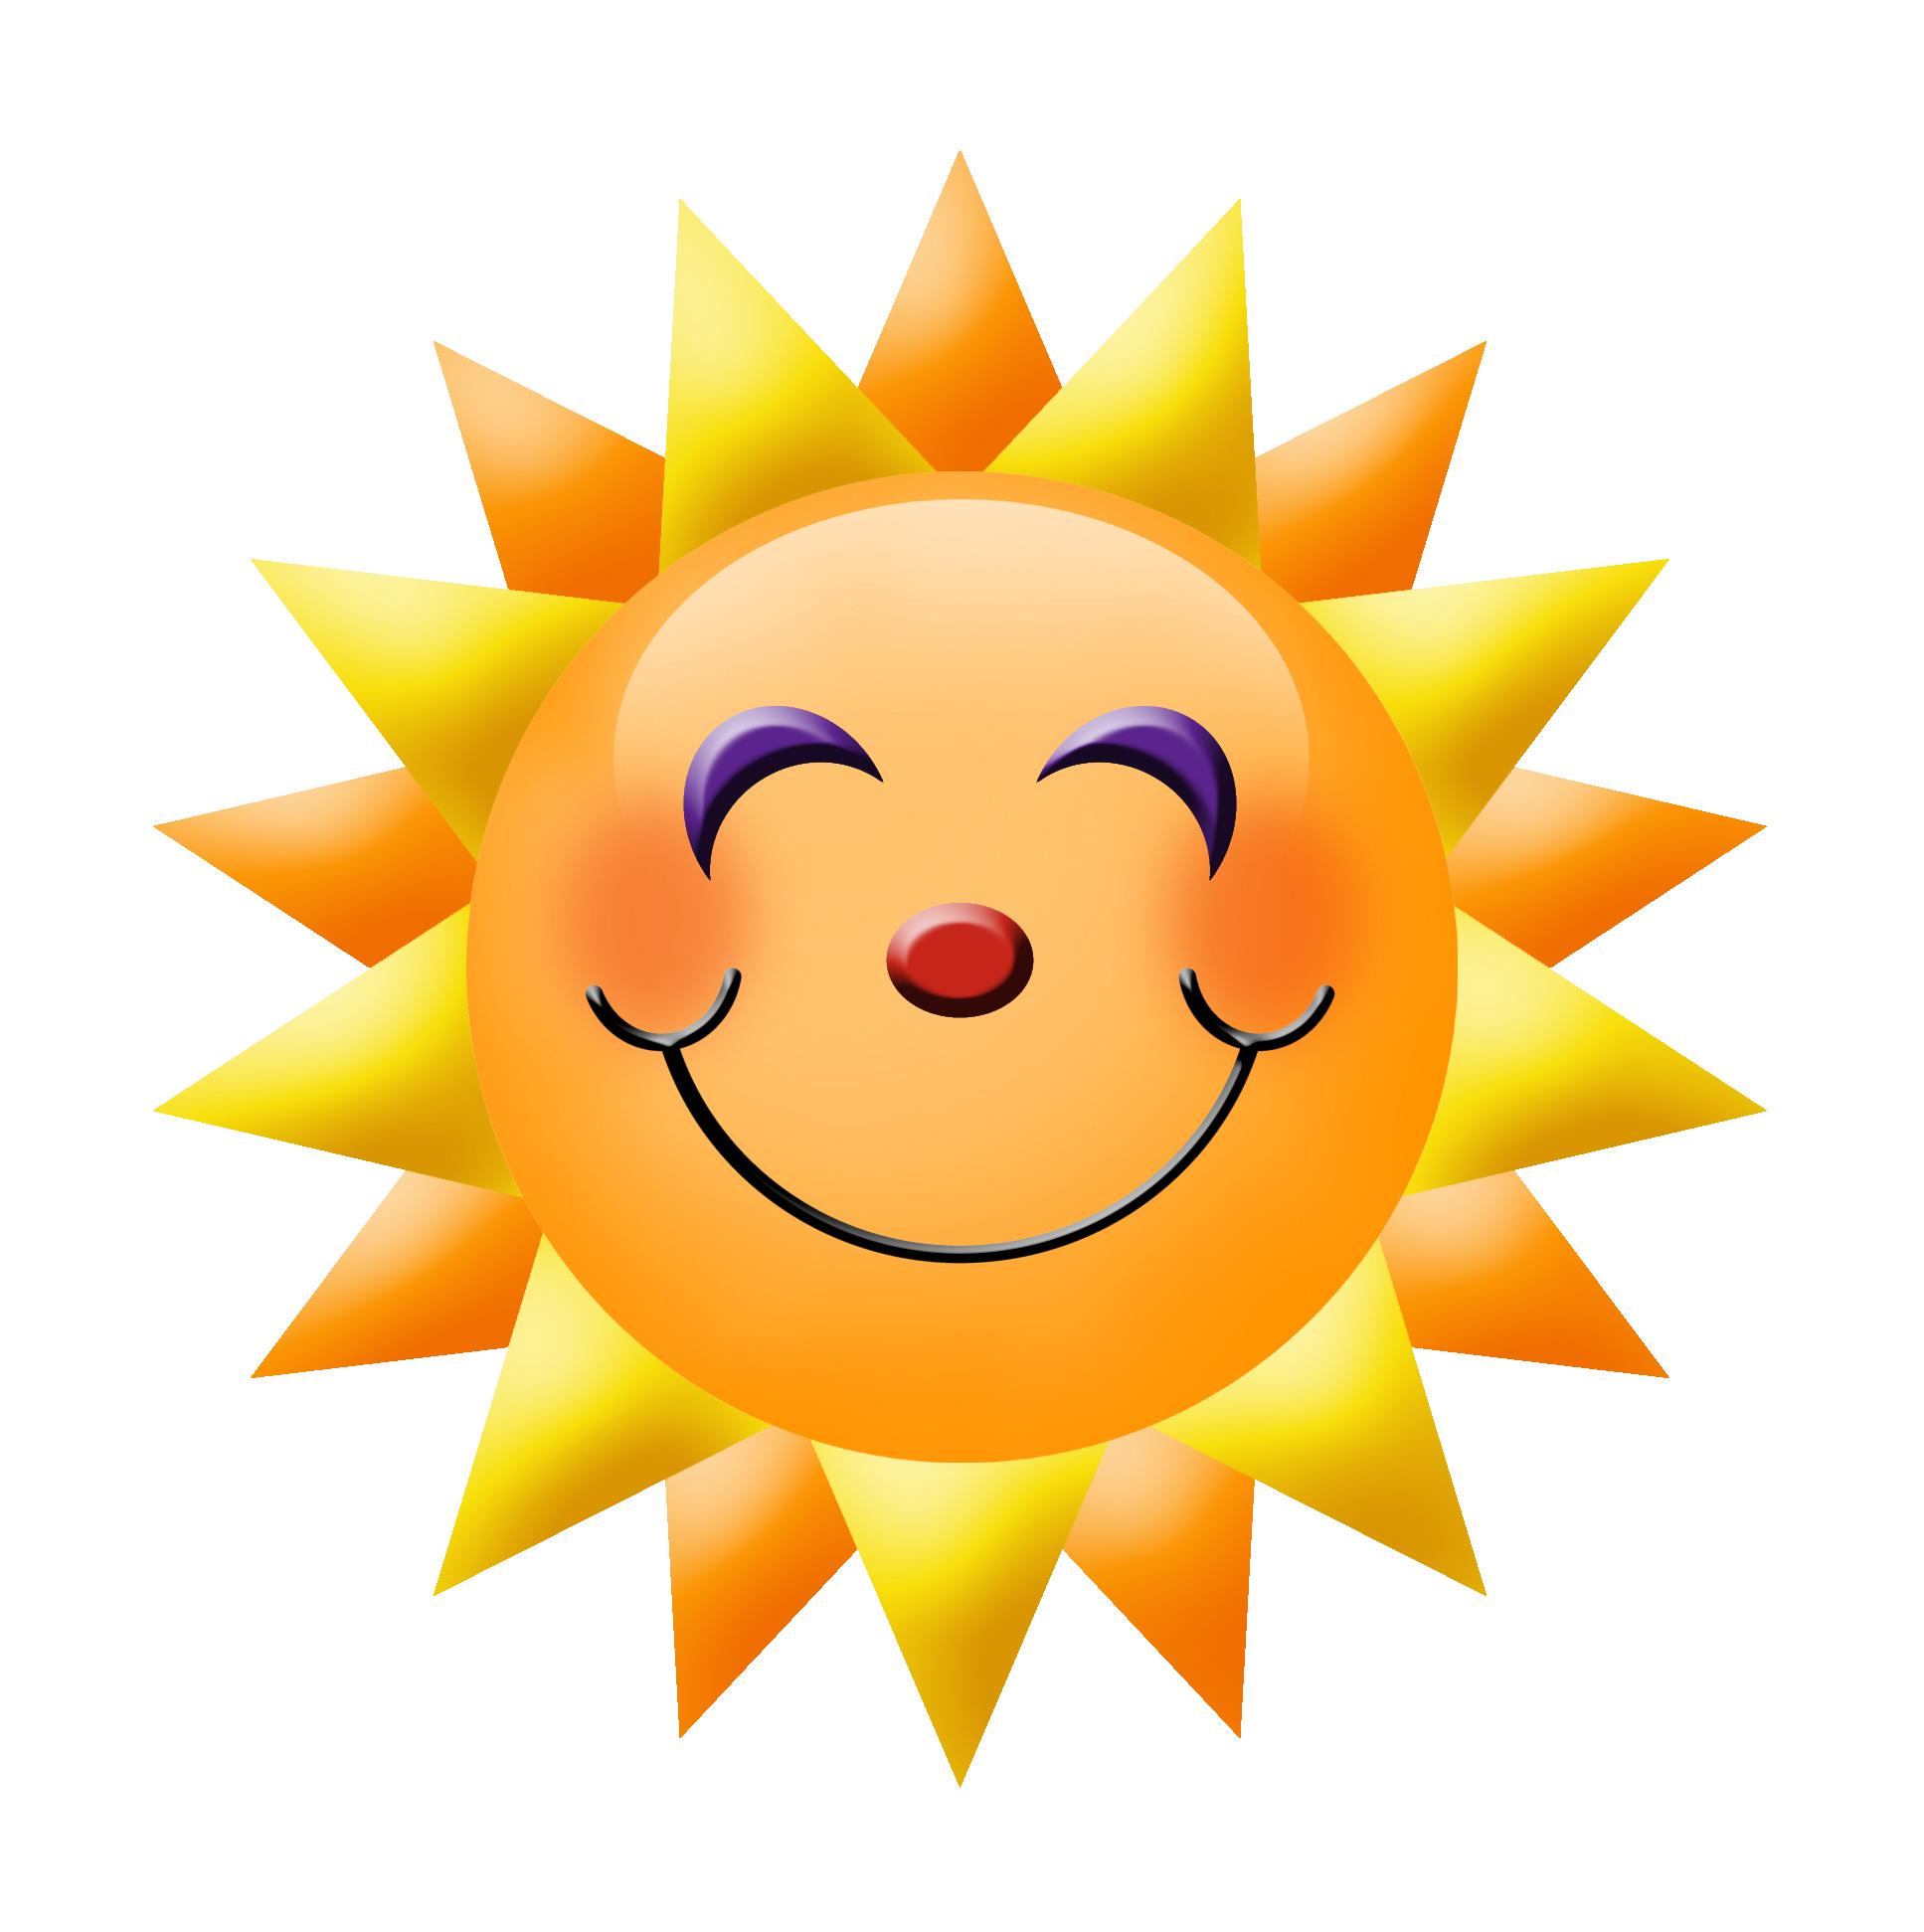 Clipart sunshine face. Free smiley sun cliparts